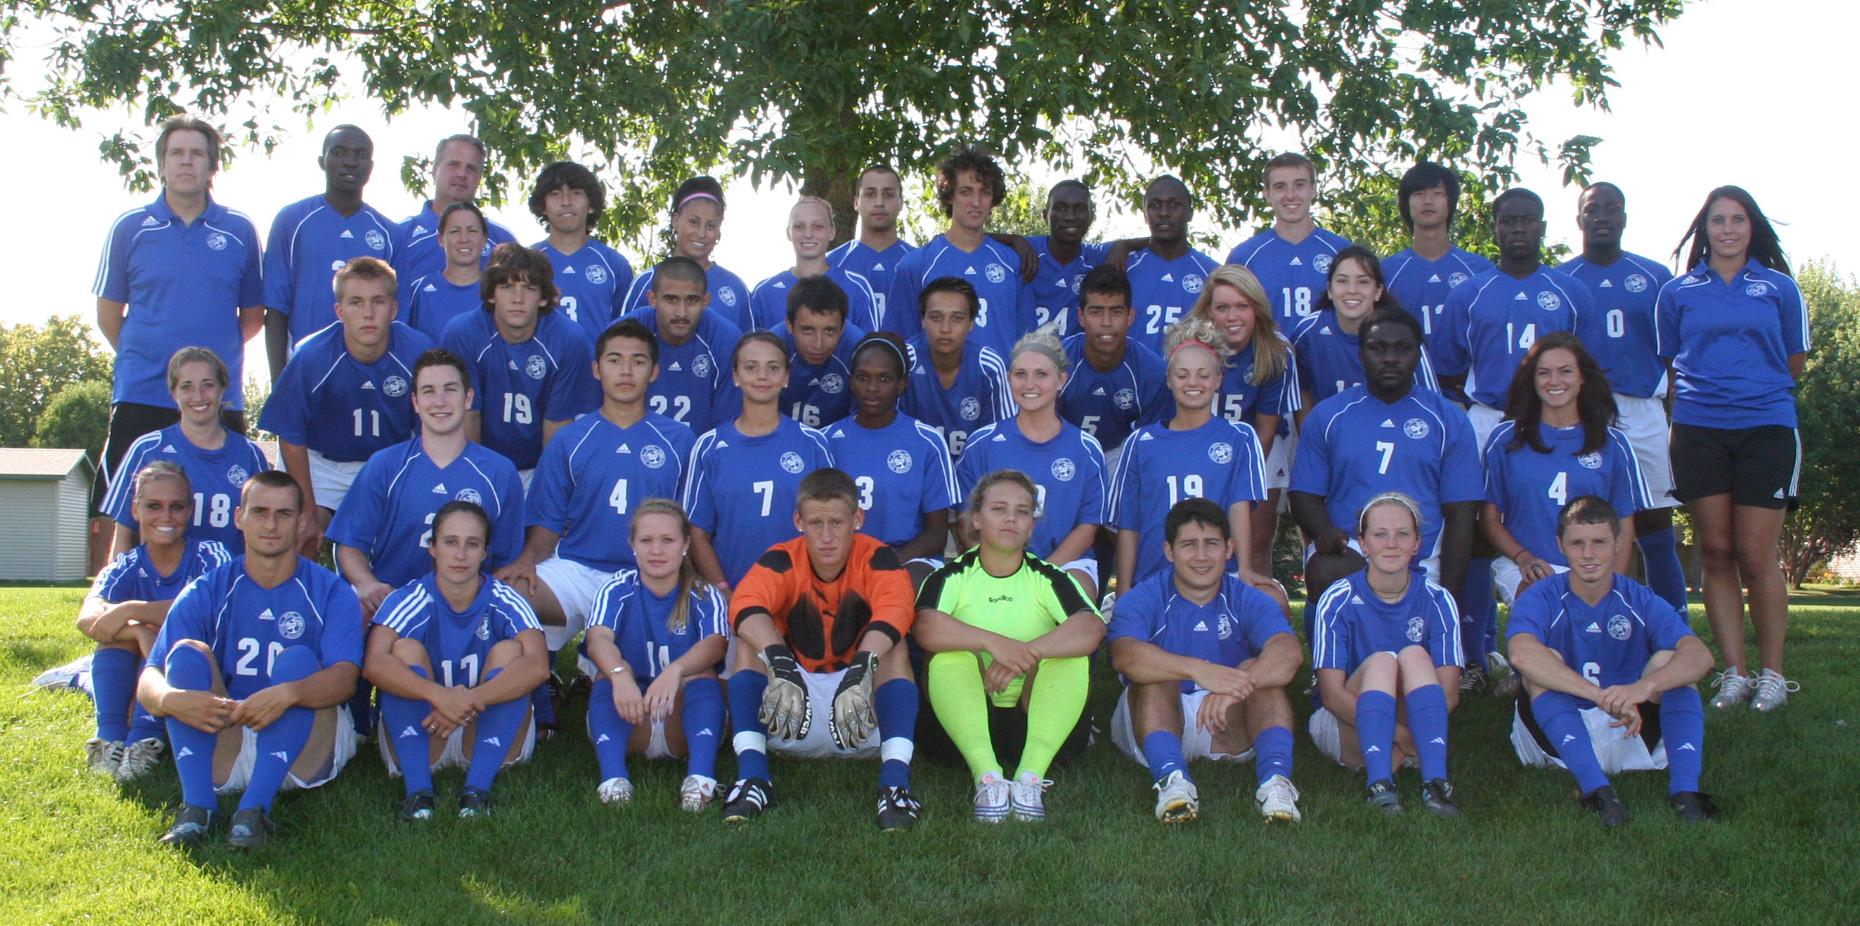 Four Blue Knights Make ICCAC First Team All-Region